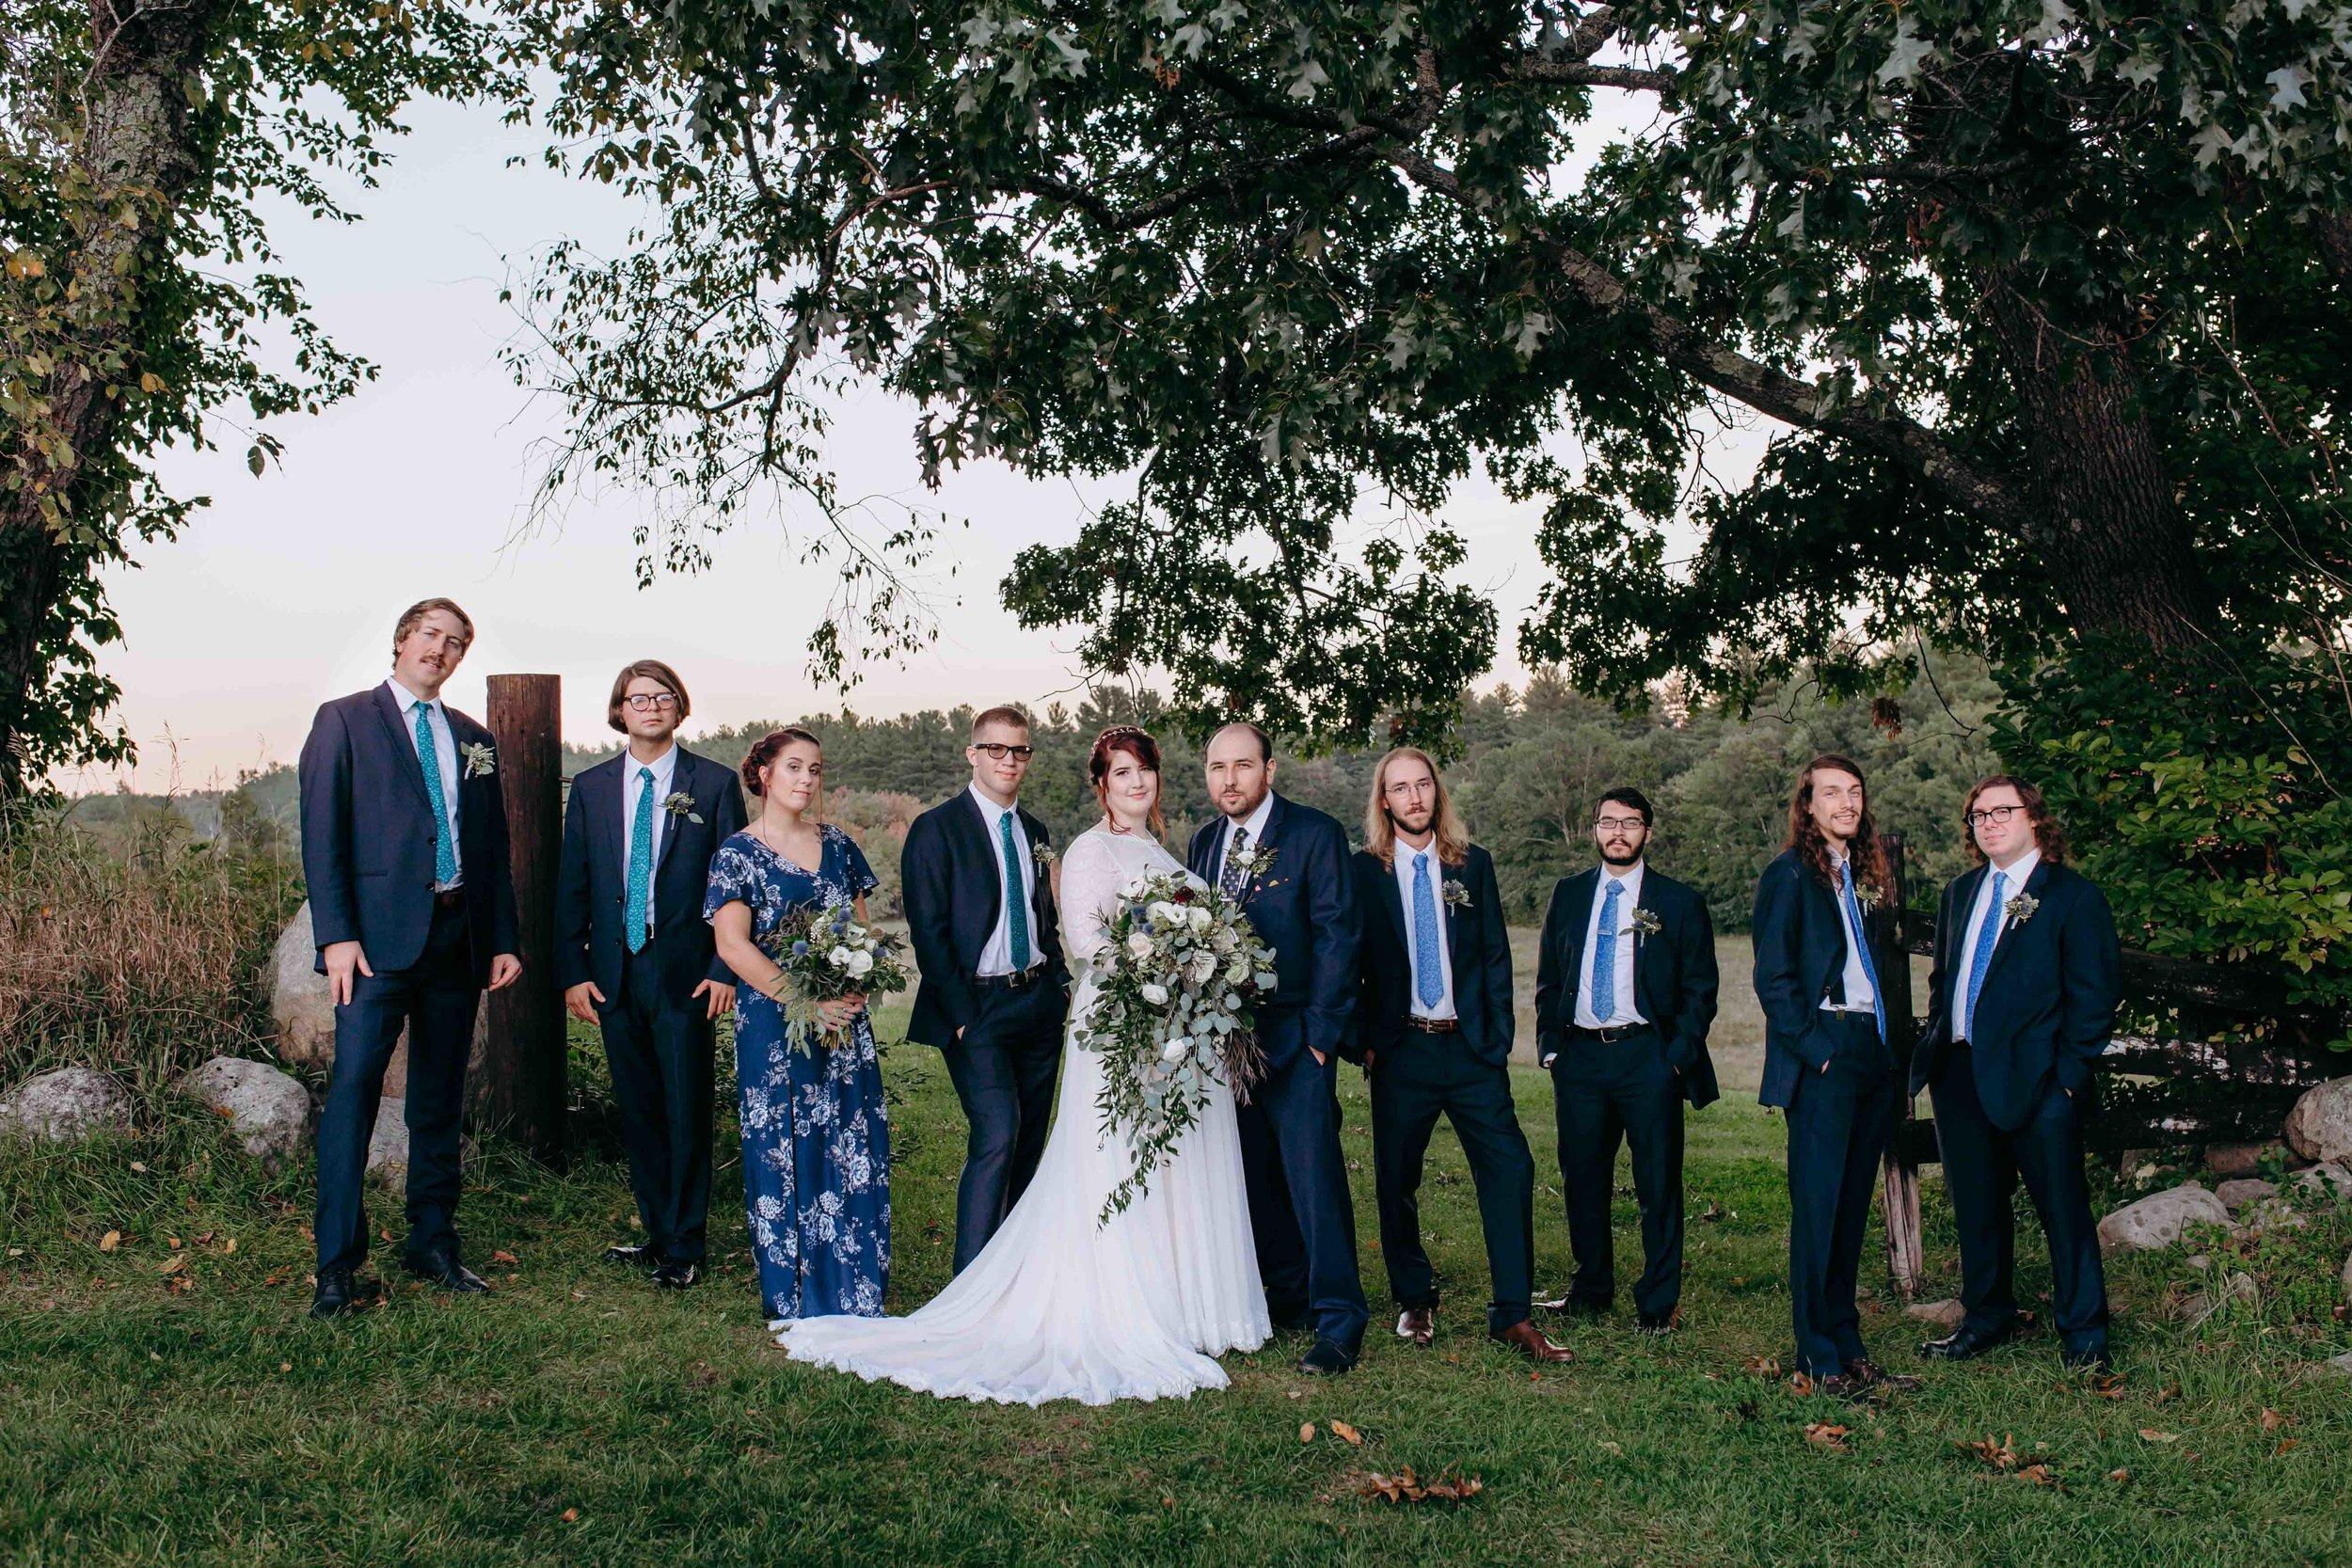 09-28-18_Nahabedian Wedding_124.jpg